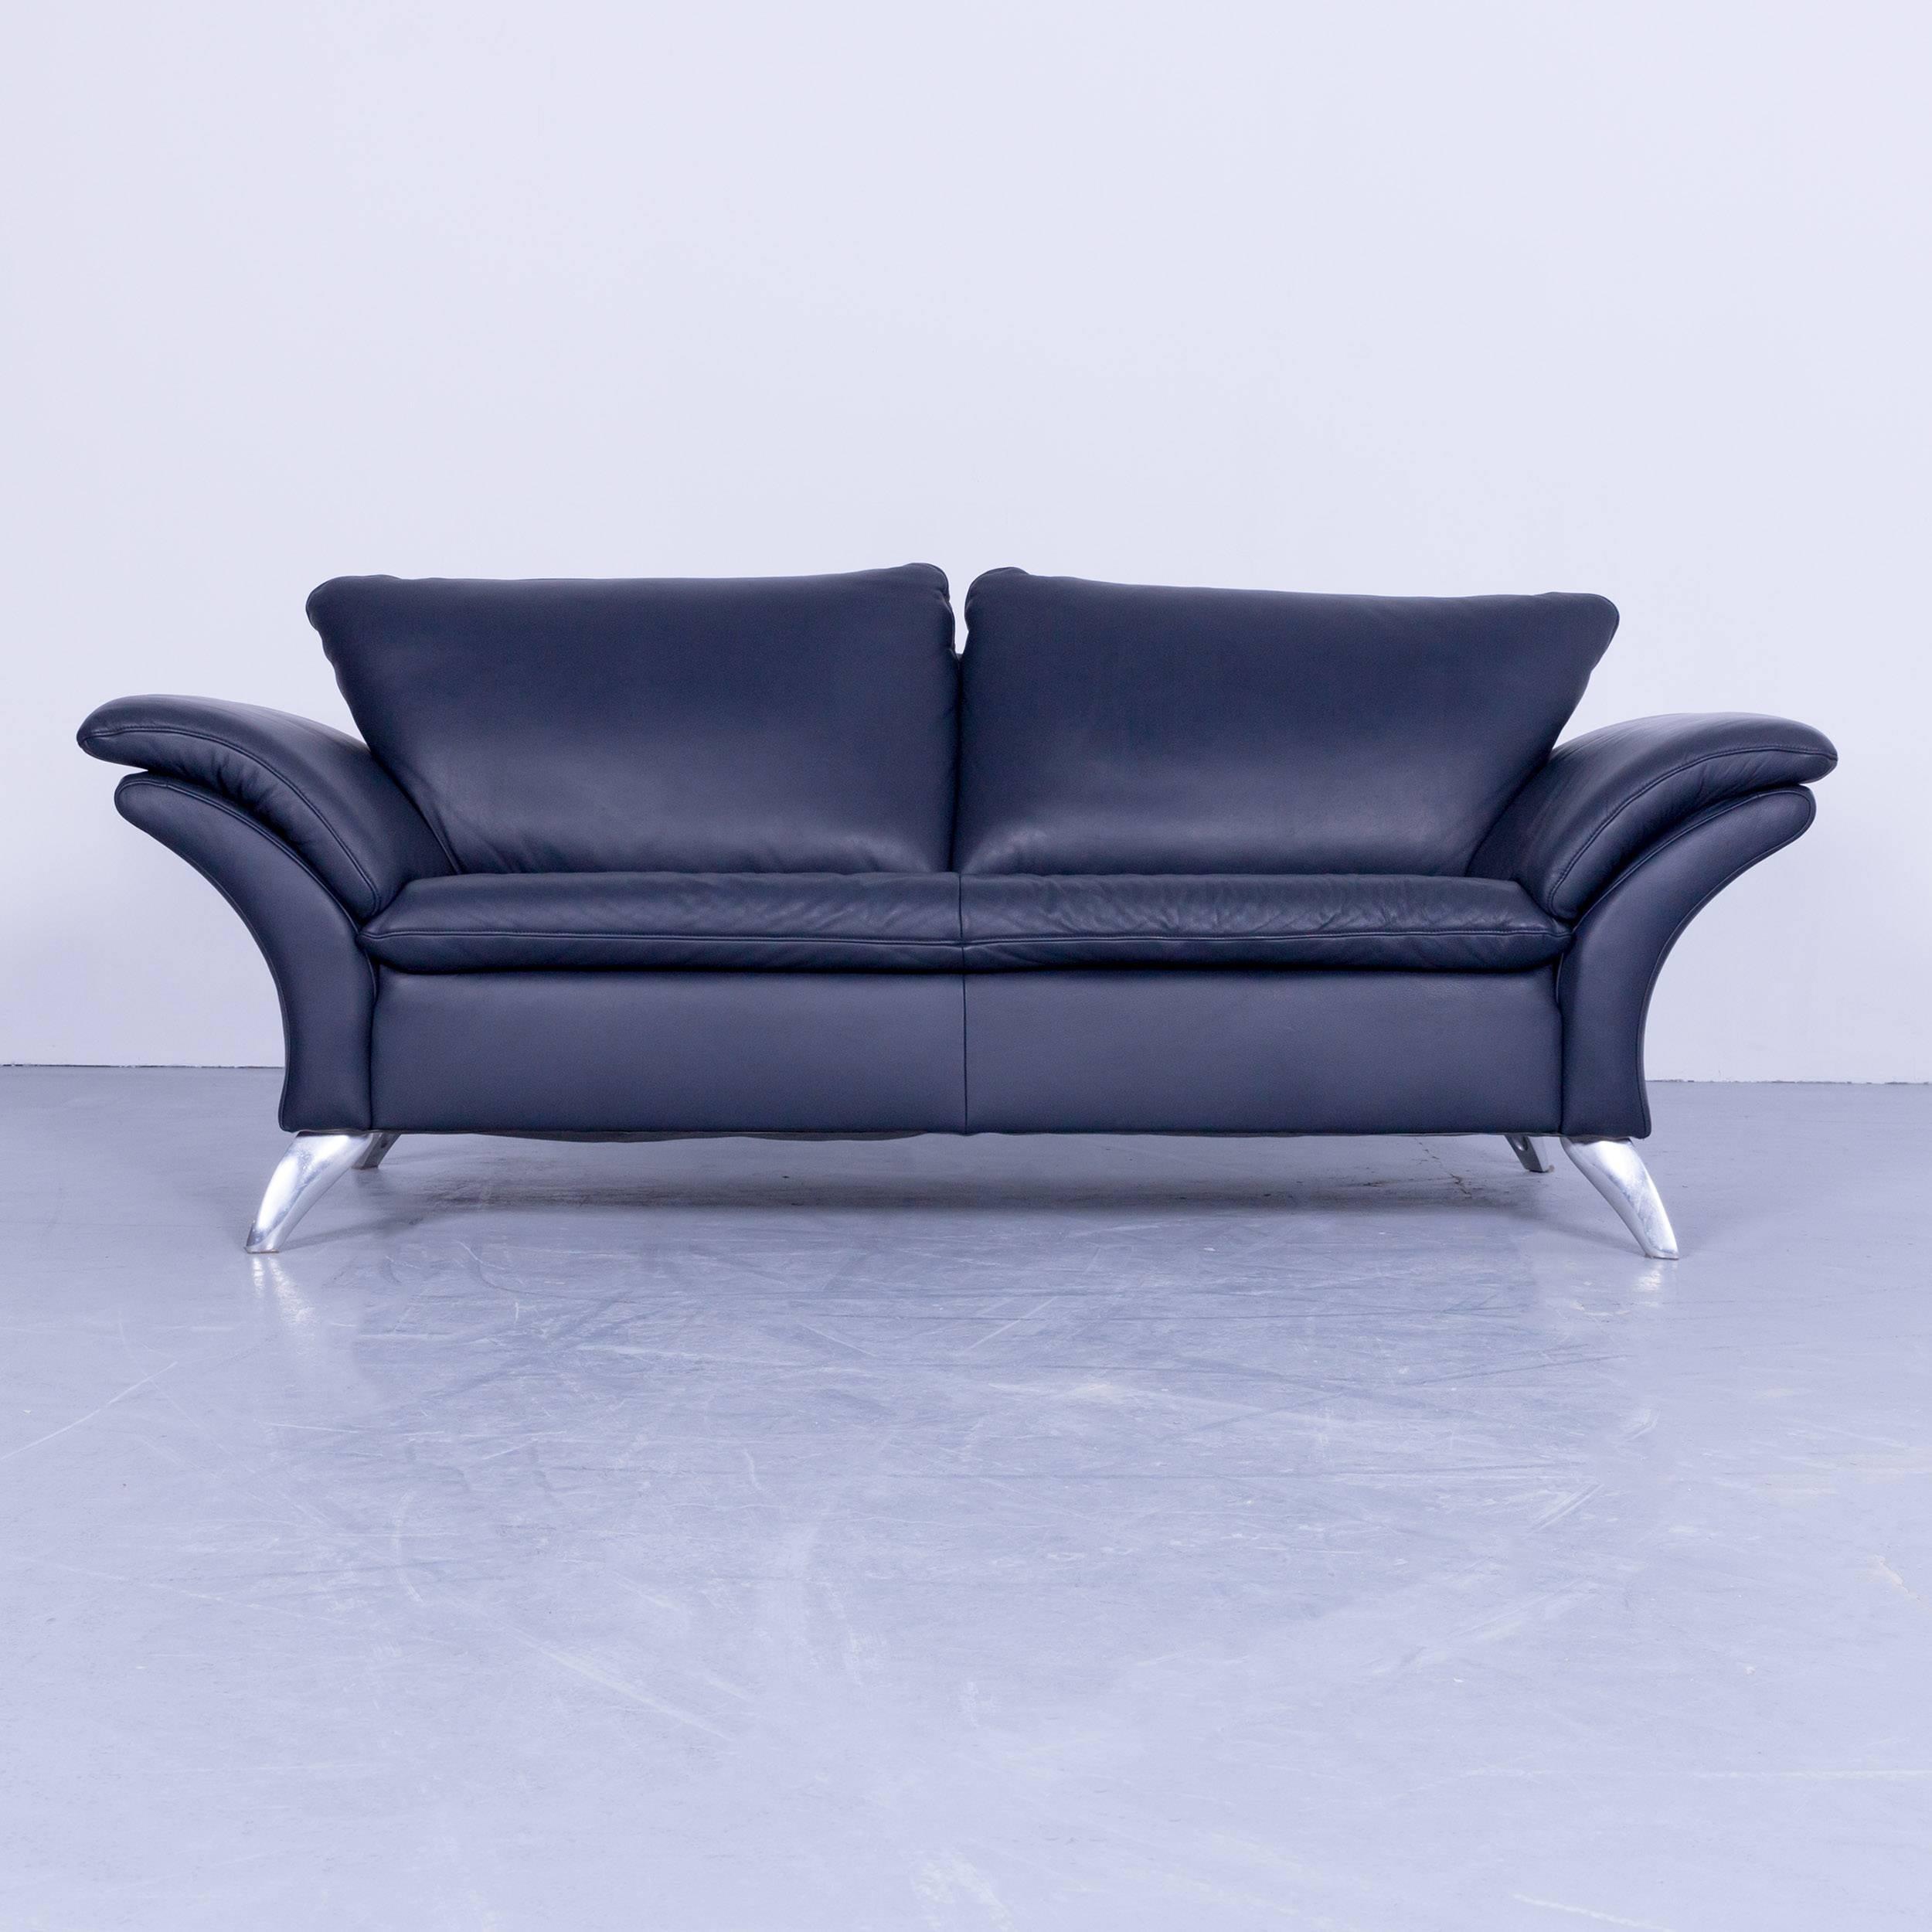 Eitelkeit Leder Sofa Garnitur Foto Von Affordable Elegant Musterring Designer Set Leather Night